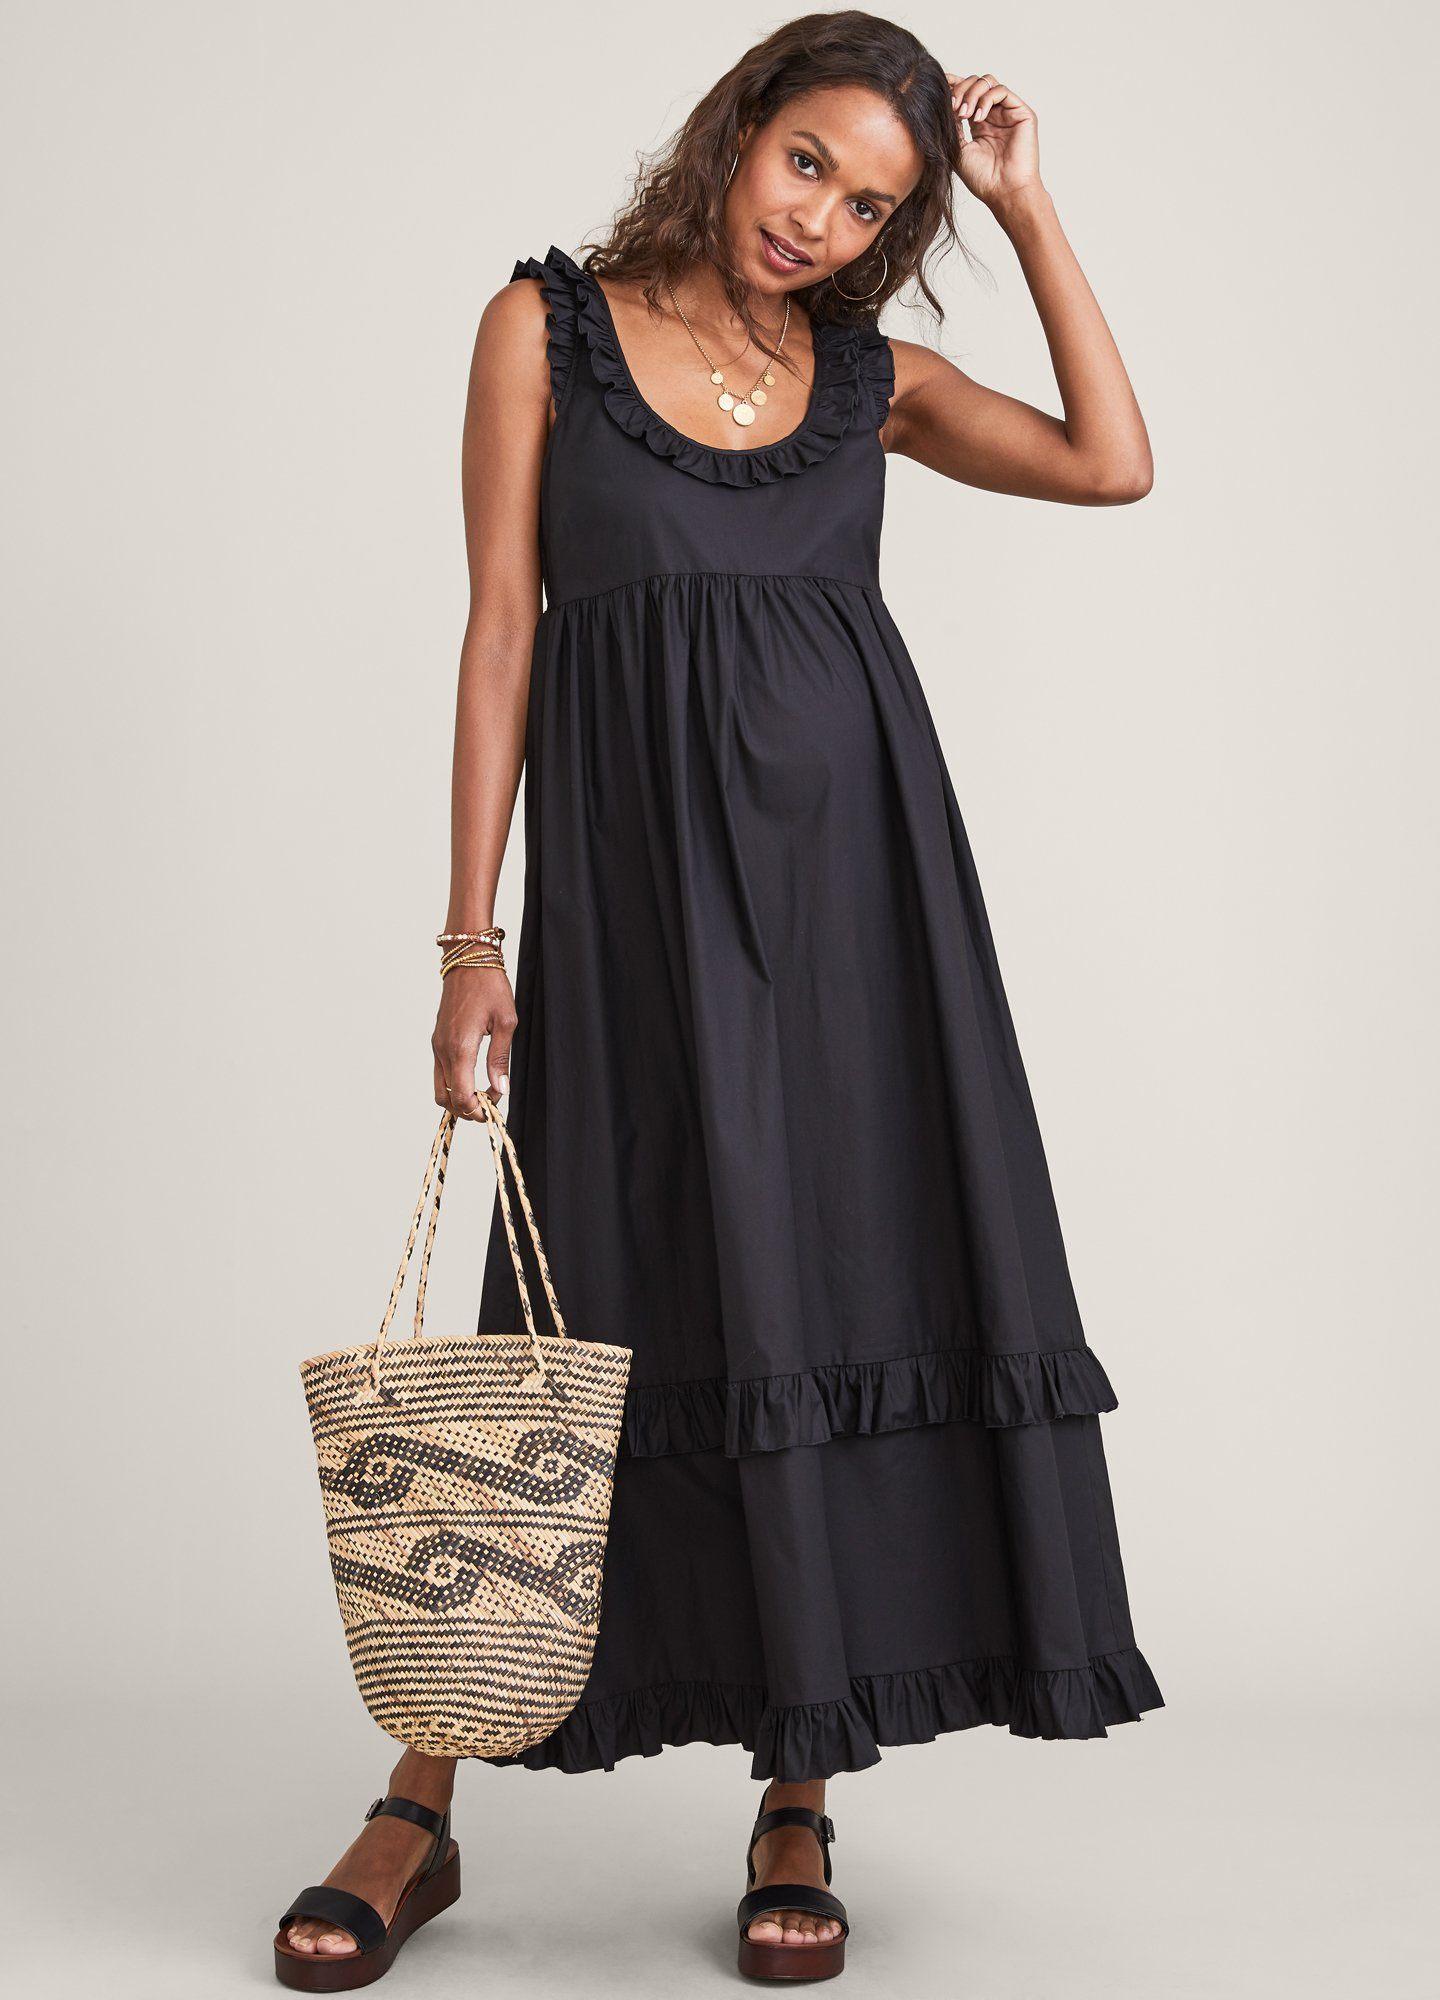 HATCH Maternity The Rafaela Dress, black, Size 1